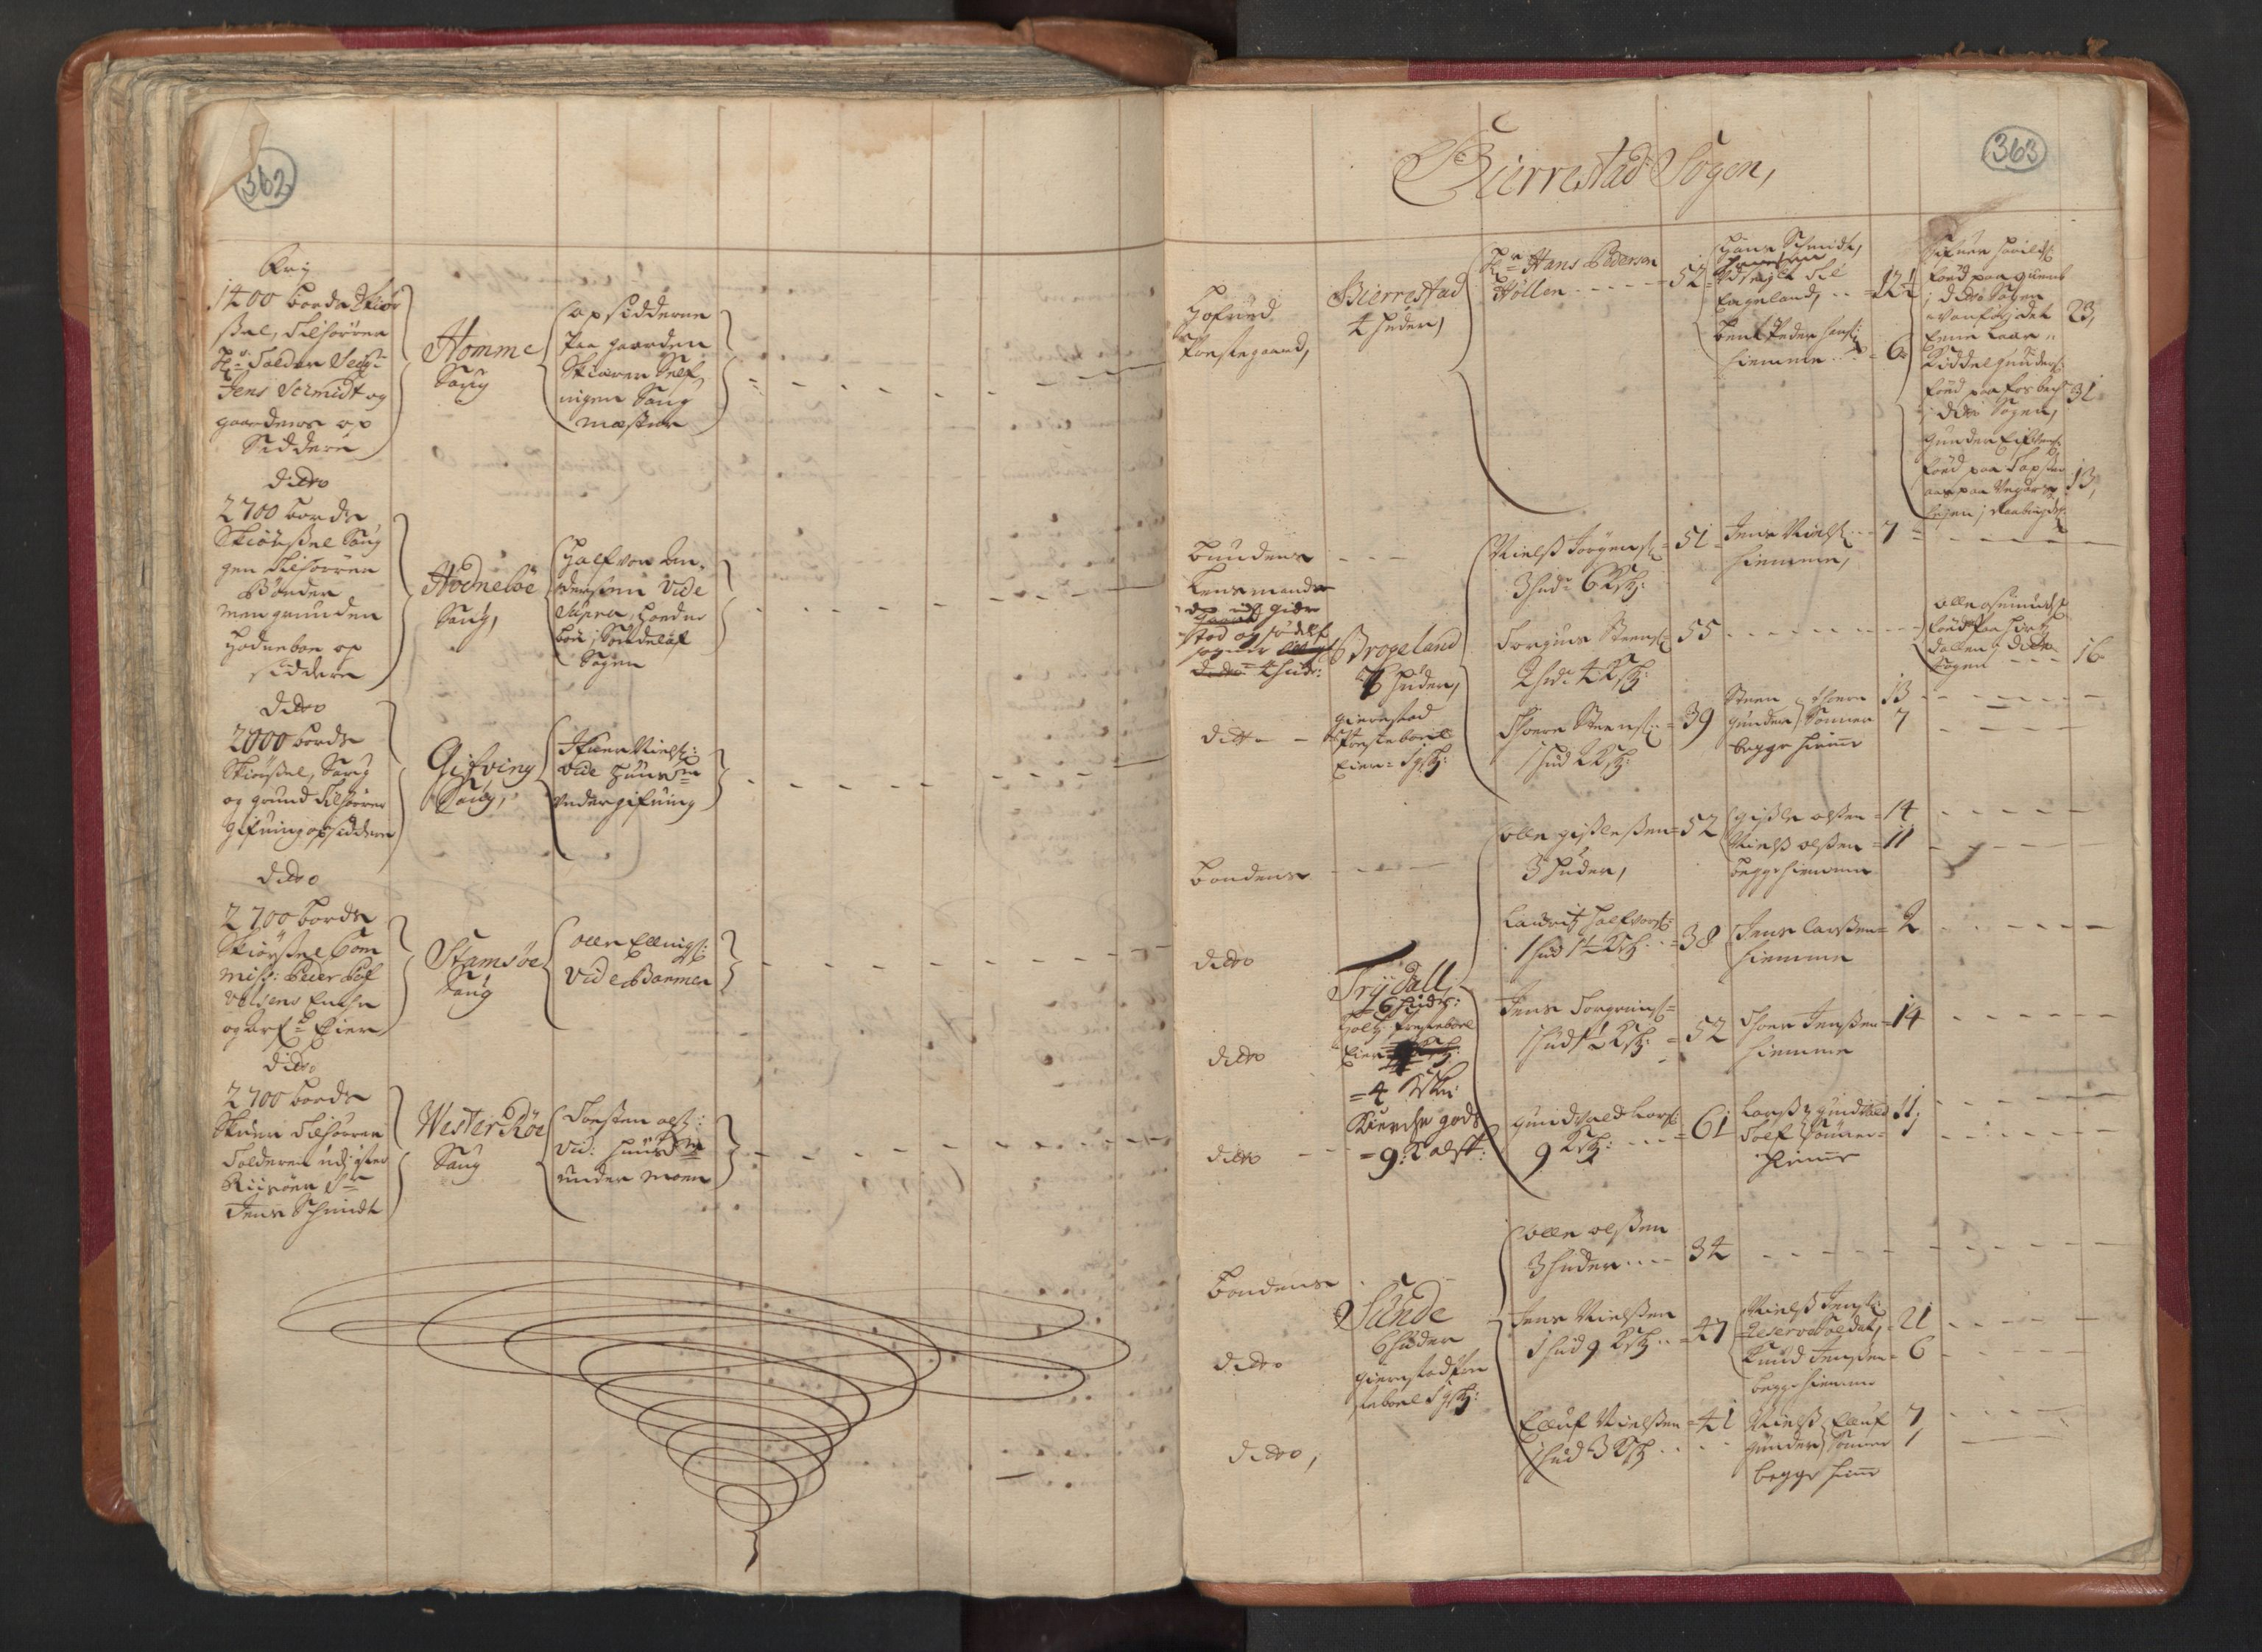 RA, Manntallet 1701, nr. 3: Nedenes fogderi, 1701, s. 362-363